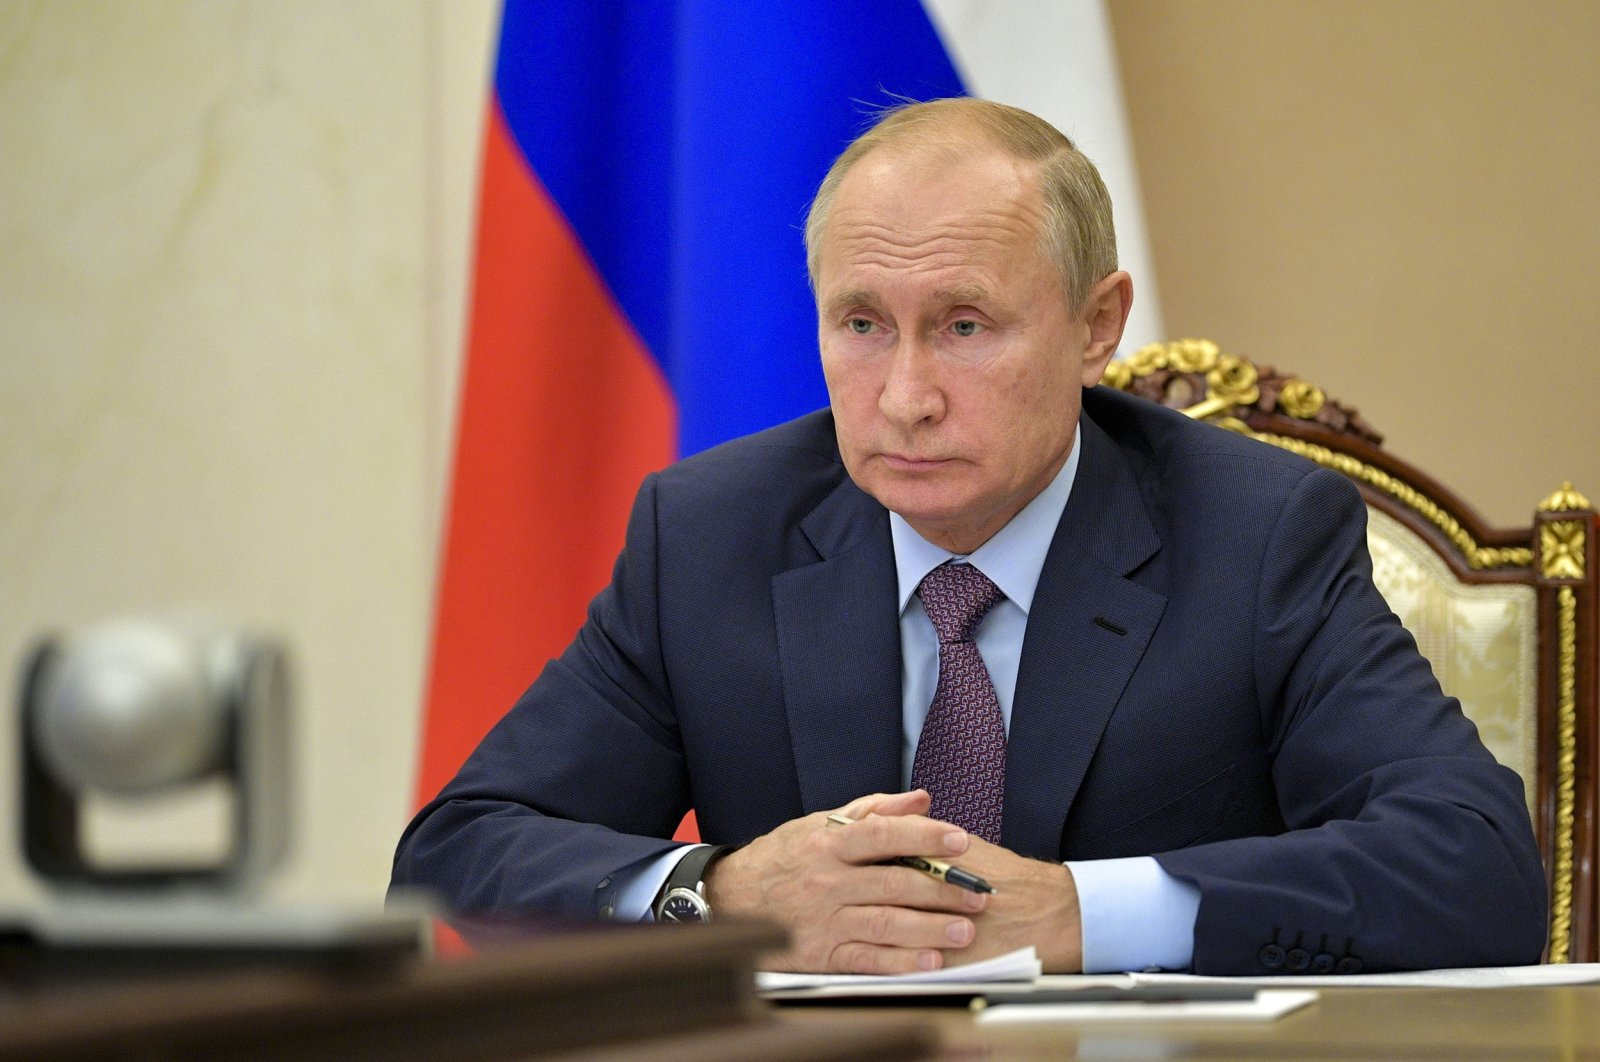 Russian President Vladimir Putin attends a videoconference at the Novo-Ogaryovo residence outside Moscow, Russia, Wednesday, Oct. 14, 2020. (Alexei Druzhinin, Sputnik, Kremlin Pool Photo via AP)